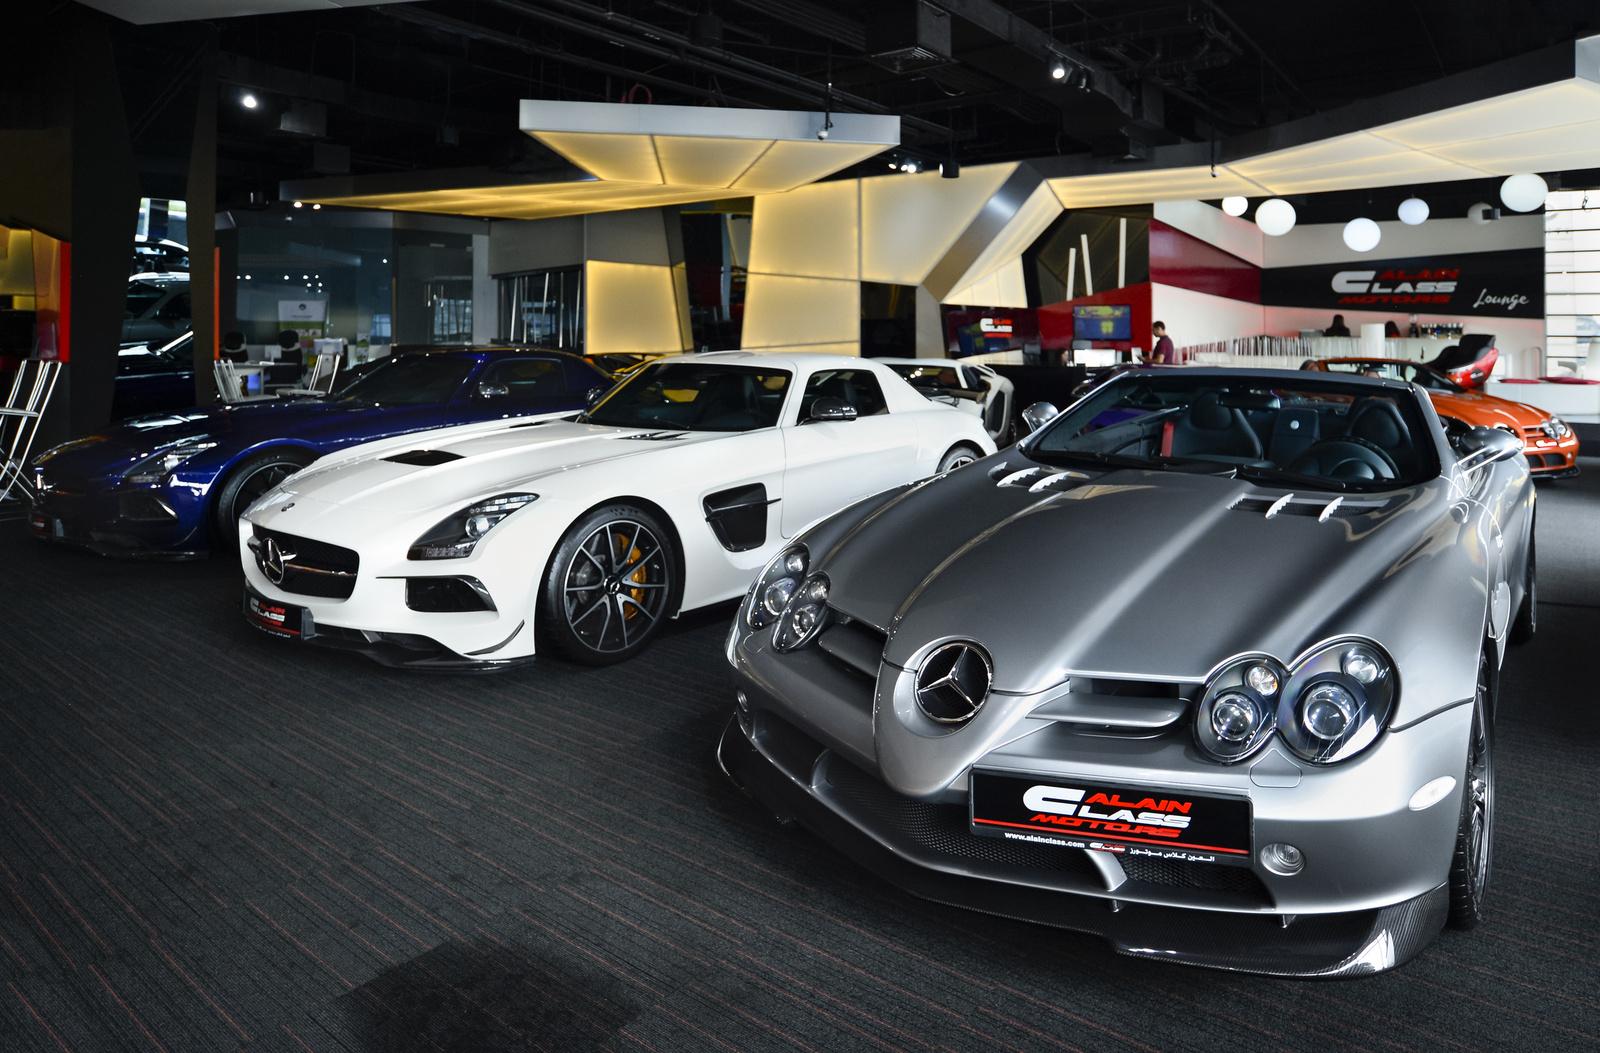 2X Mercedes SLS AMG Black Series - 2X Mercedes SLR 722 S